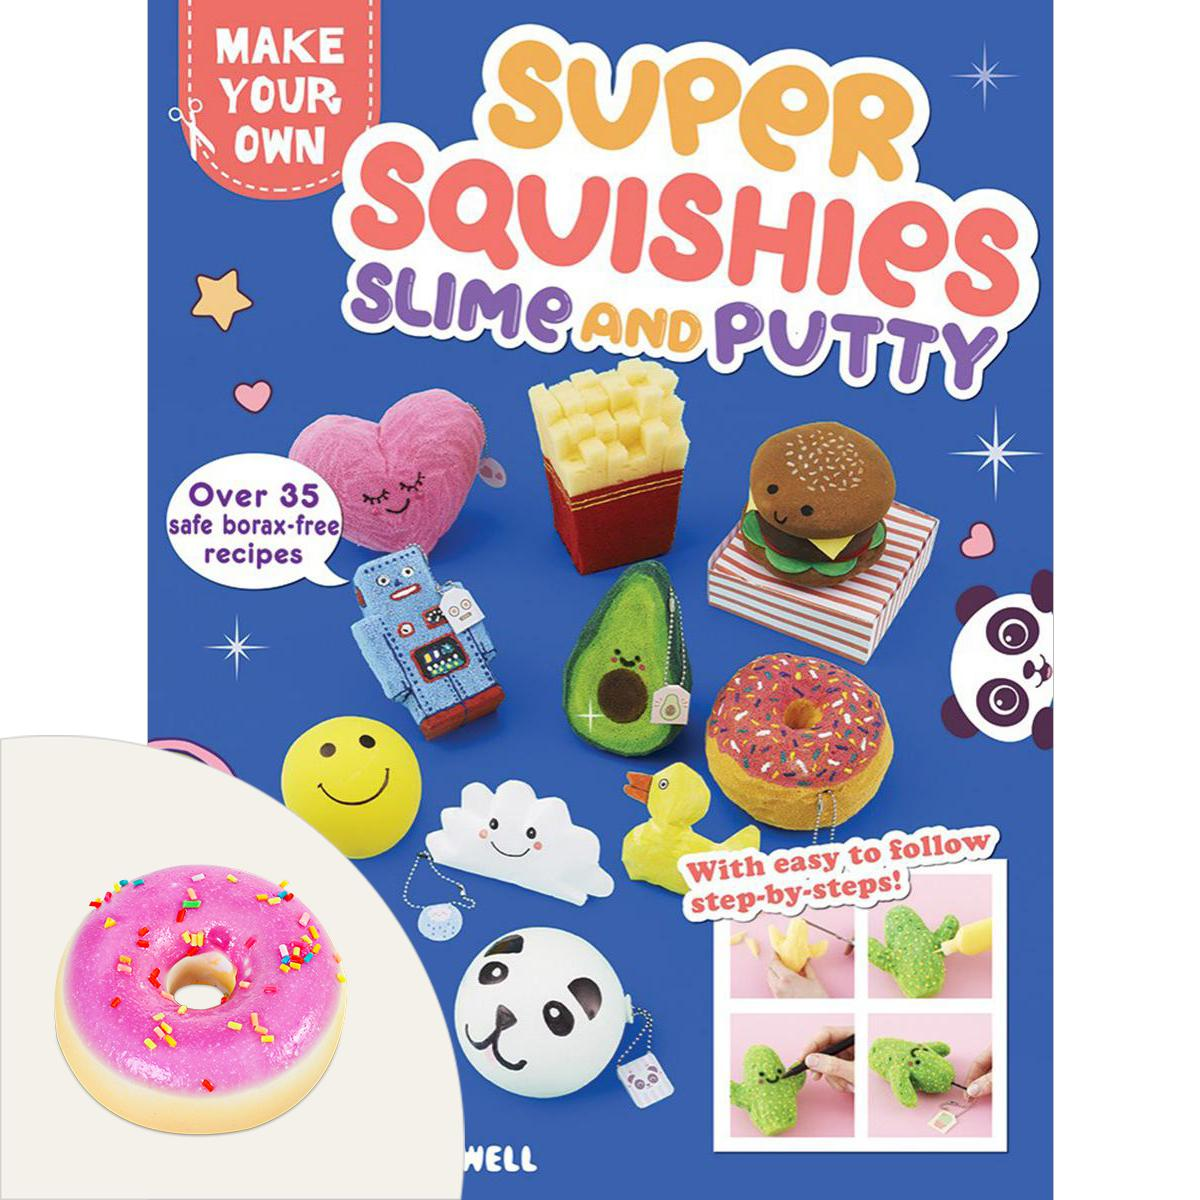 Super Squishies Pack